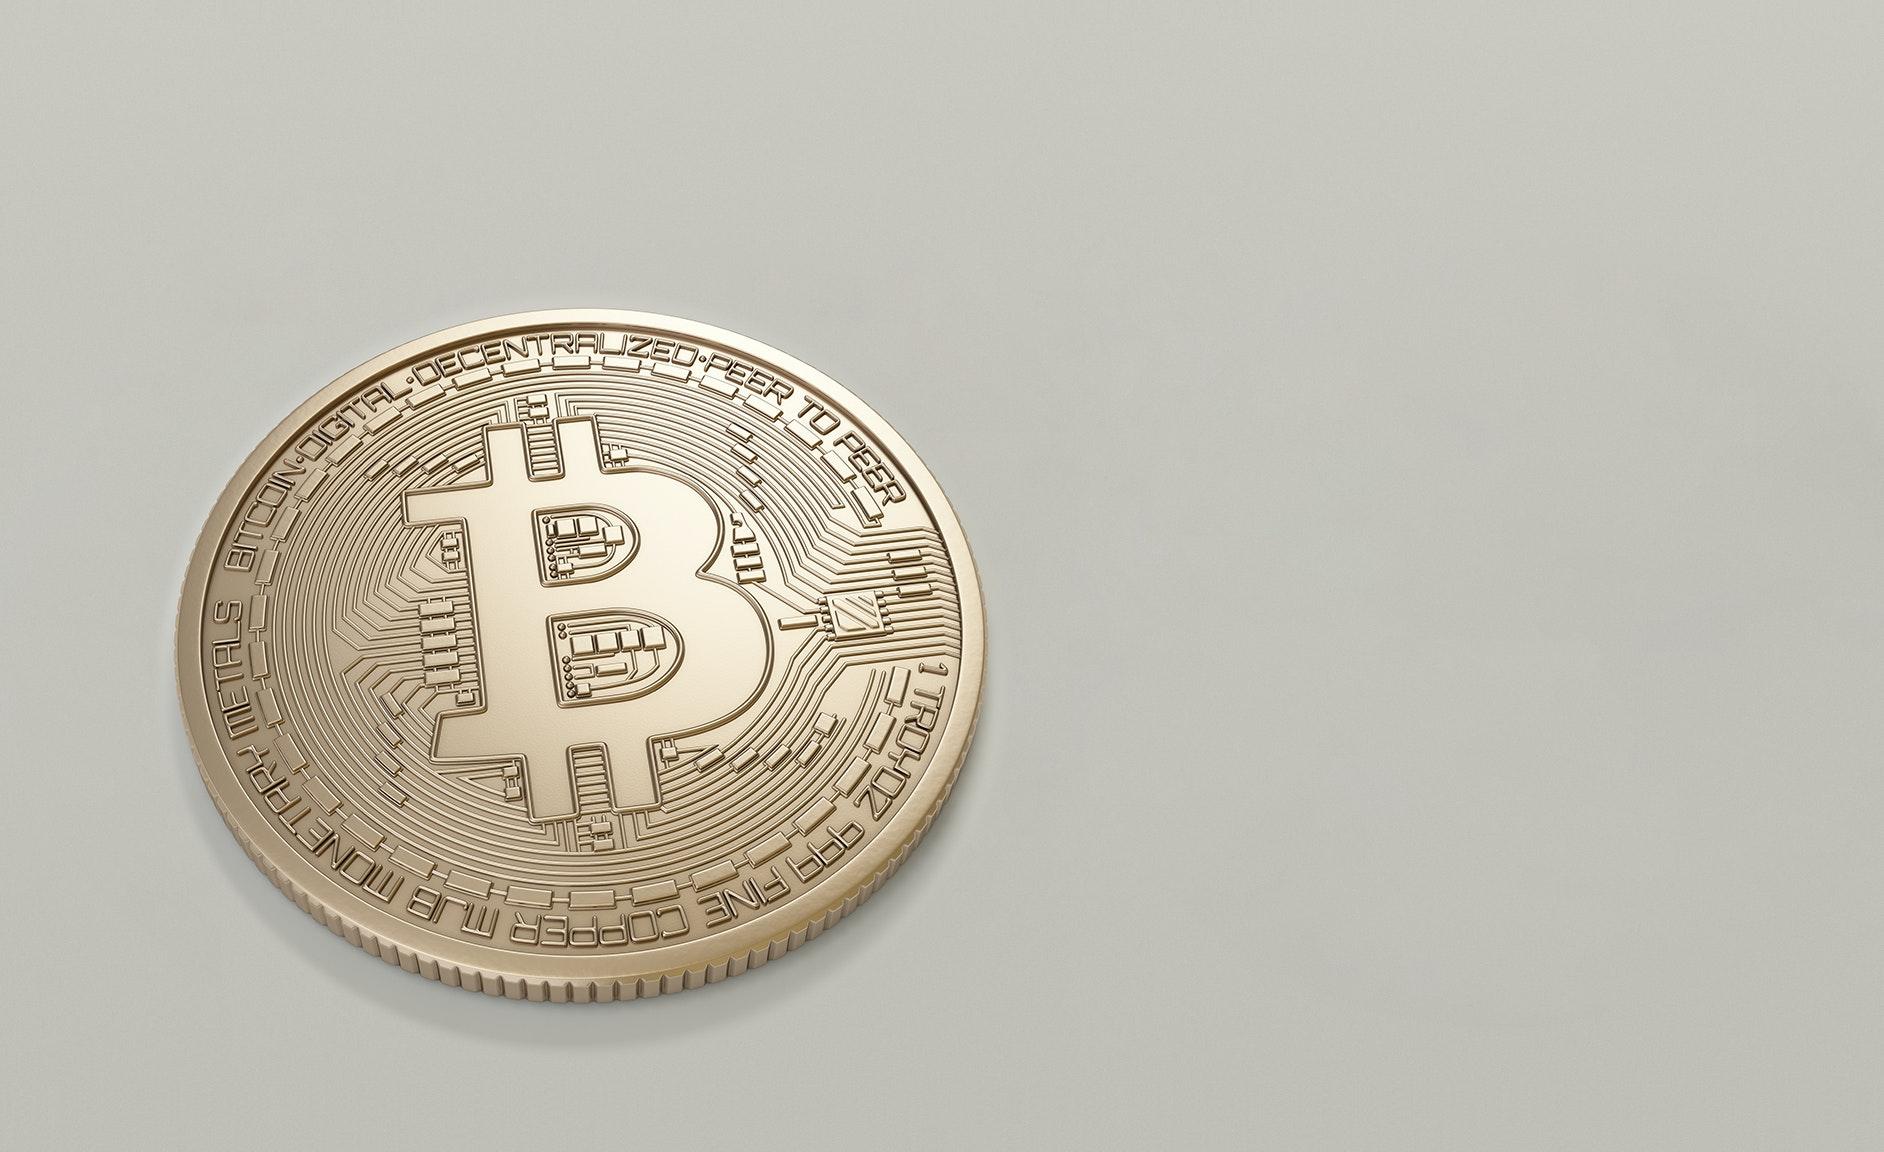 zadržavanje vaše kriptovalute na trgovanju je kripto novac dobra investicija